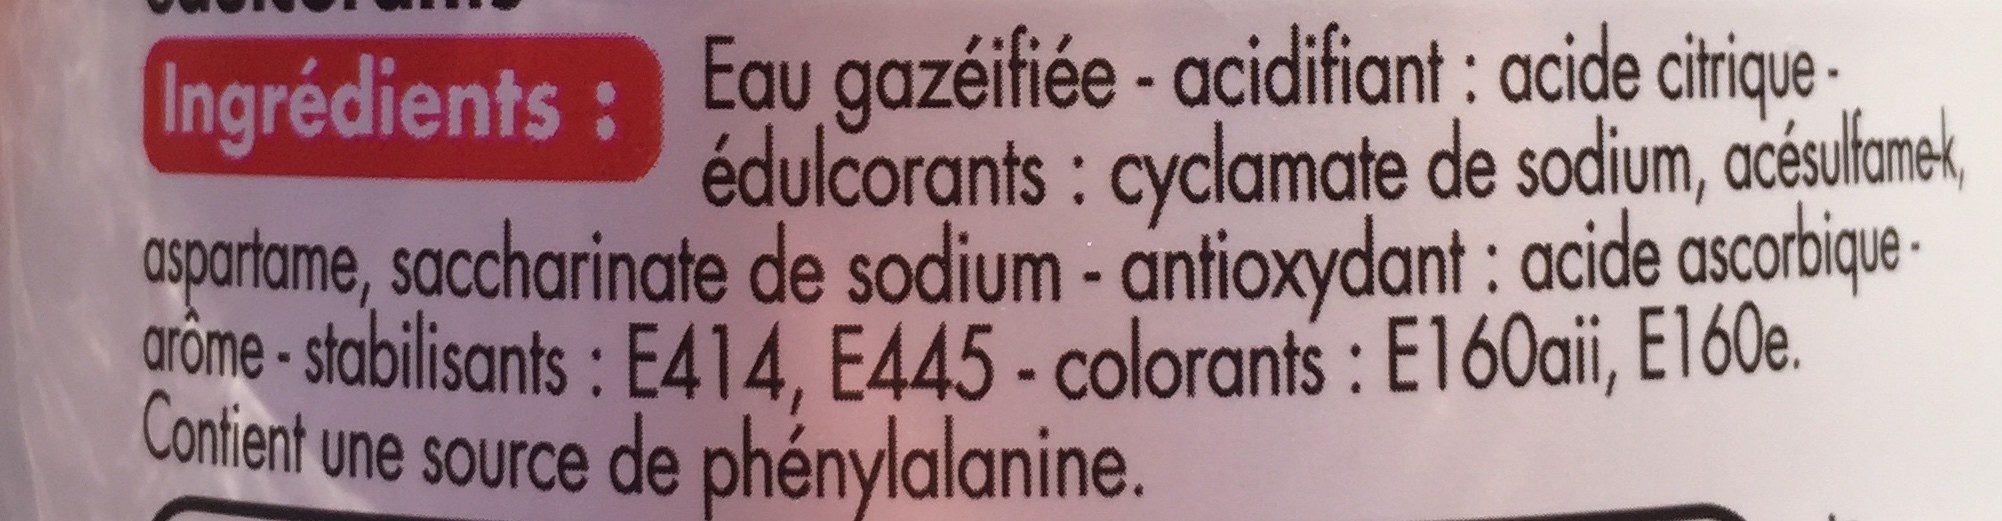 Soda goût Orange - Ingredients